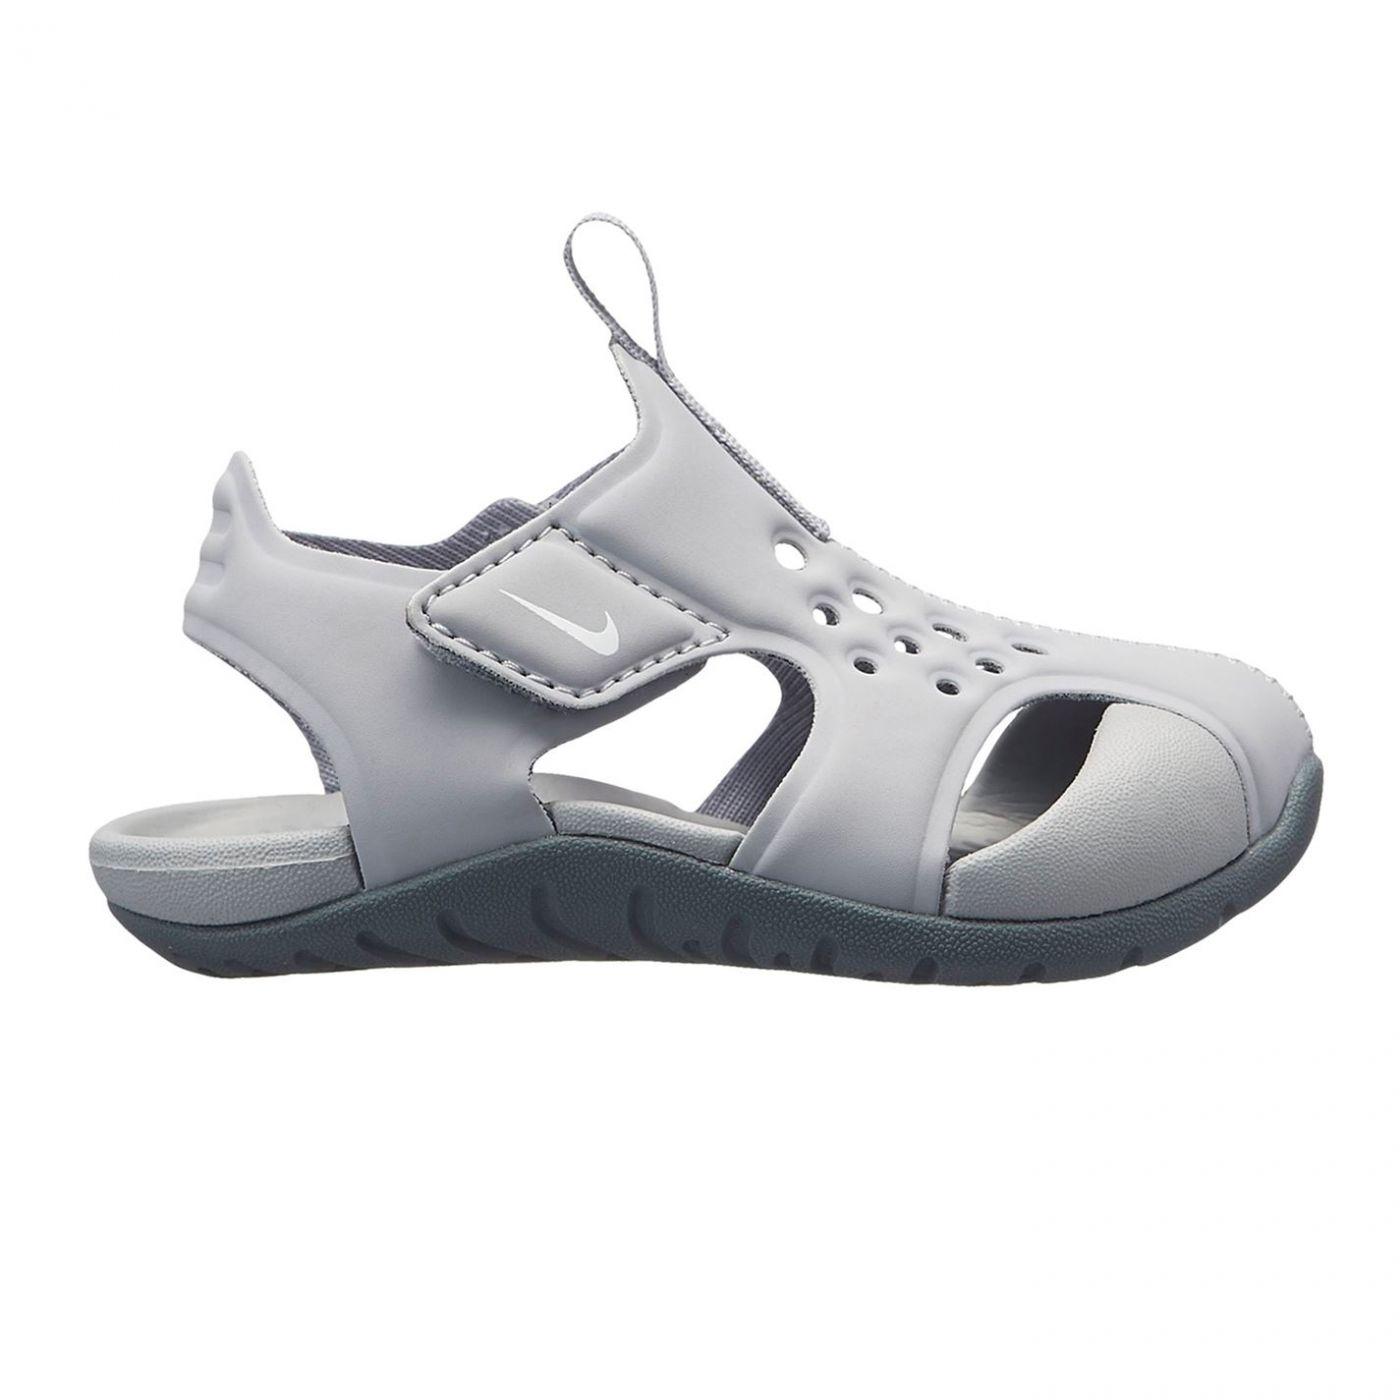 e0a04bdf6578 Nike Sunray Protect Infant Boys Sandals - FACTCOOL